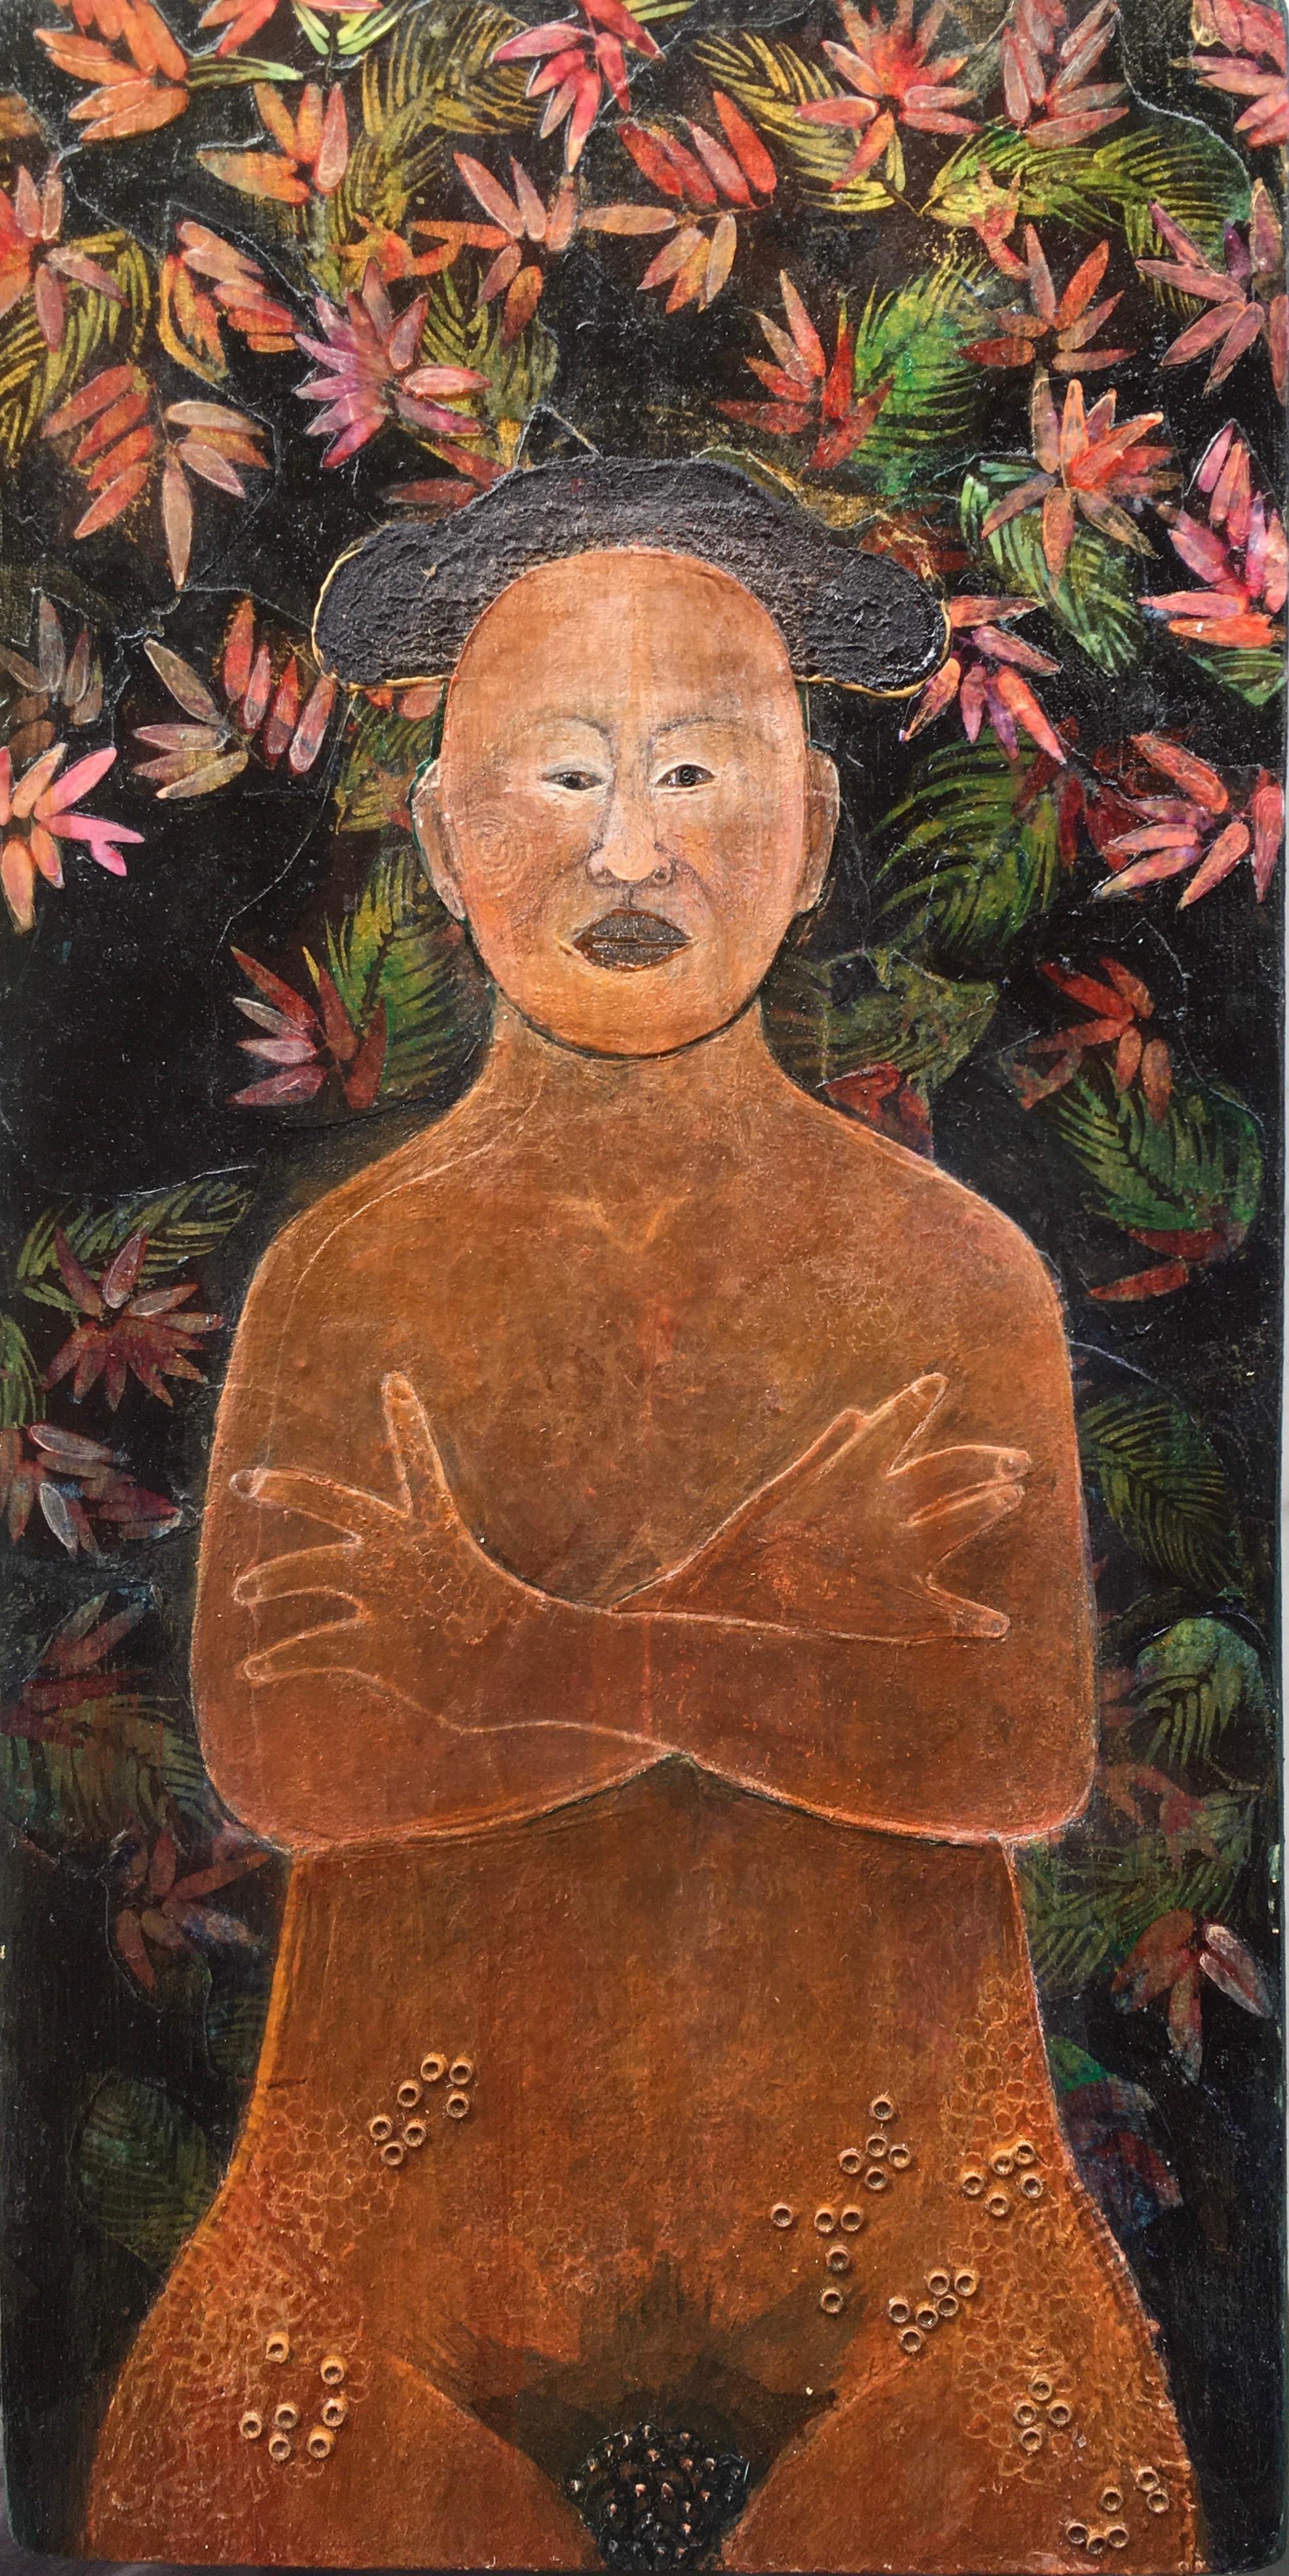 Matador, mixed media portrait of nude woman in dark garden